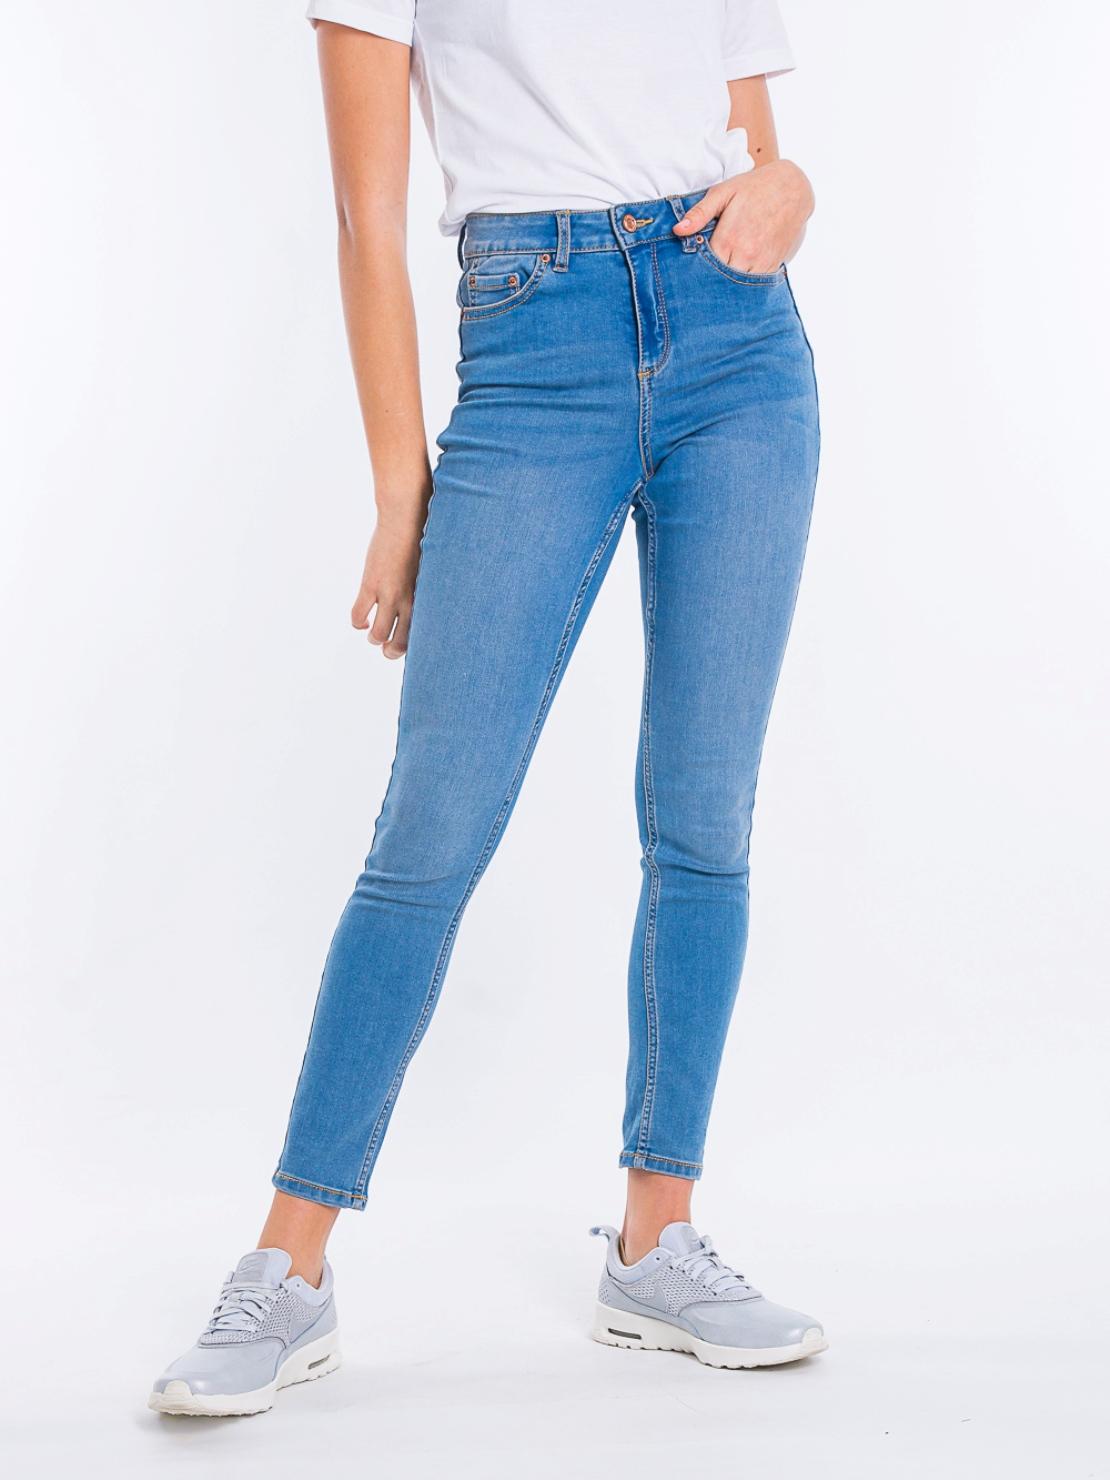 Джинсы super skinny Jennyfer 10defye Голубой Free Style